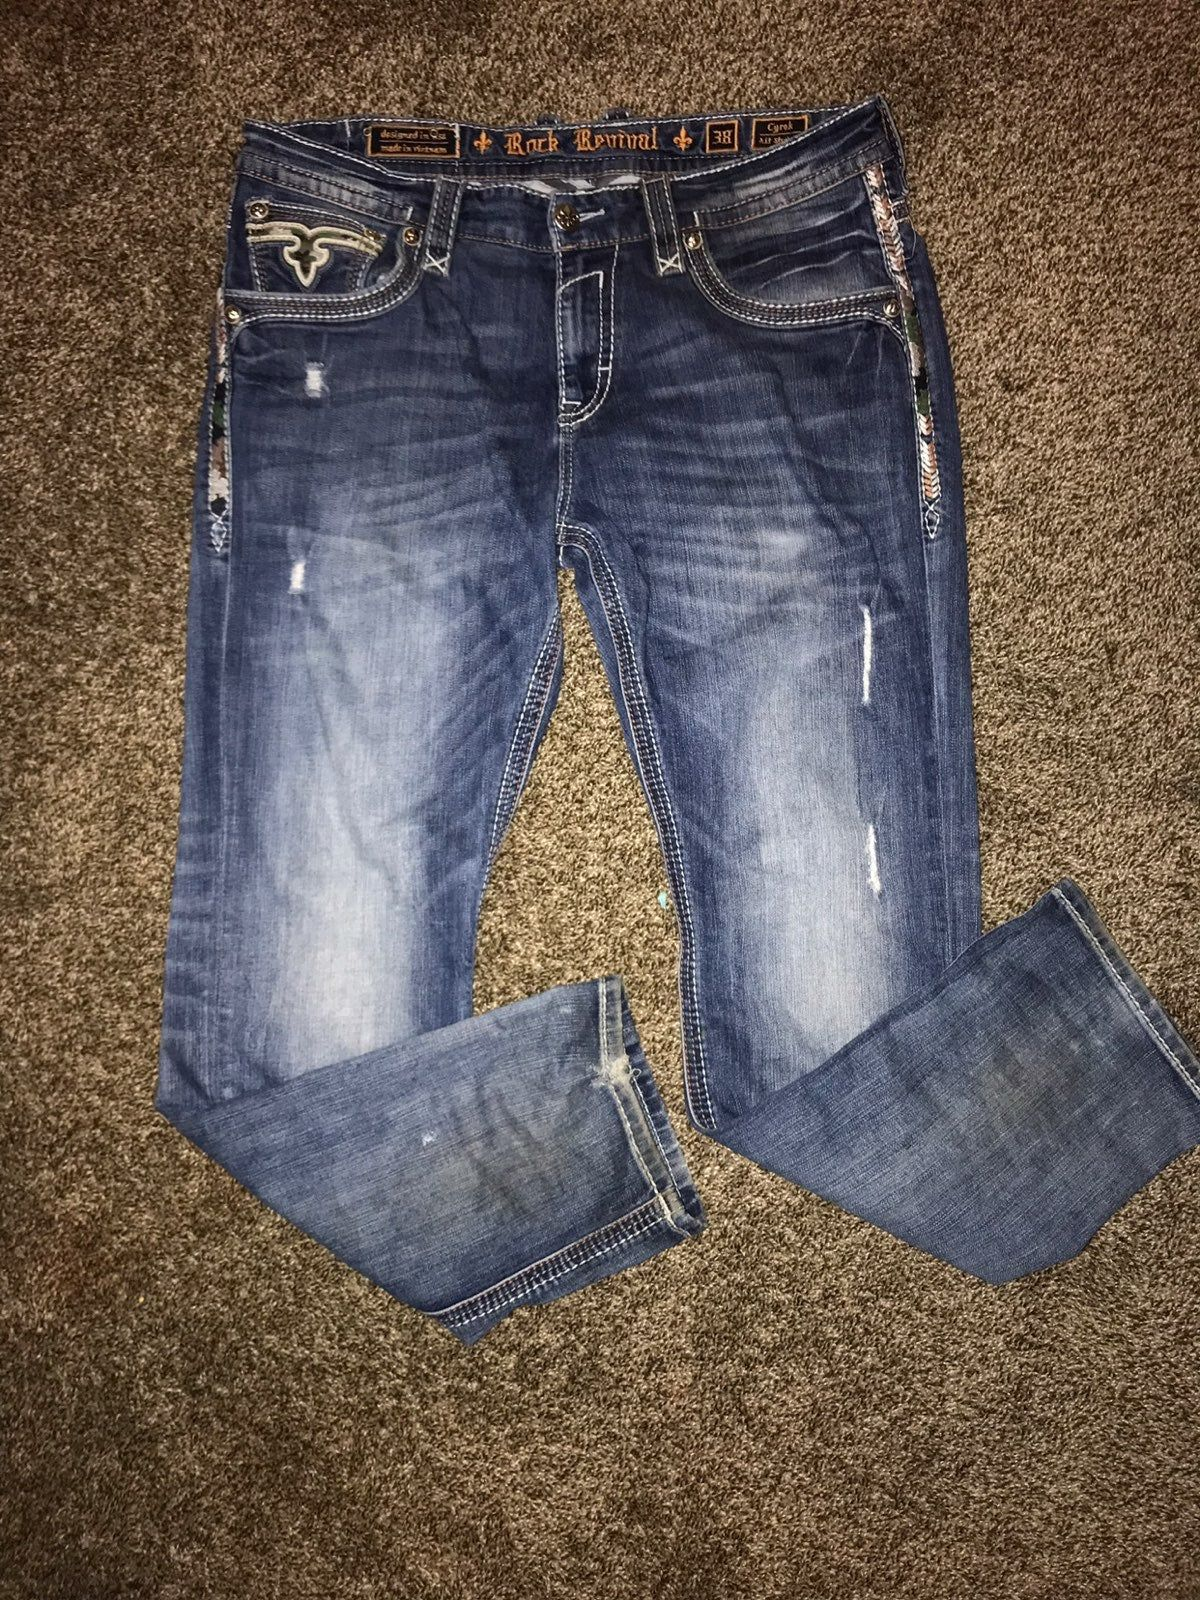 Rock Revival Jeans Size 38 Rock Revival Jeans Rock Revival Jeans